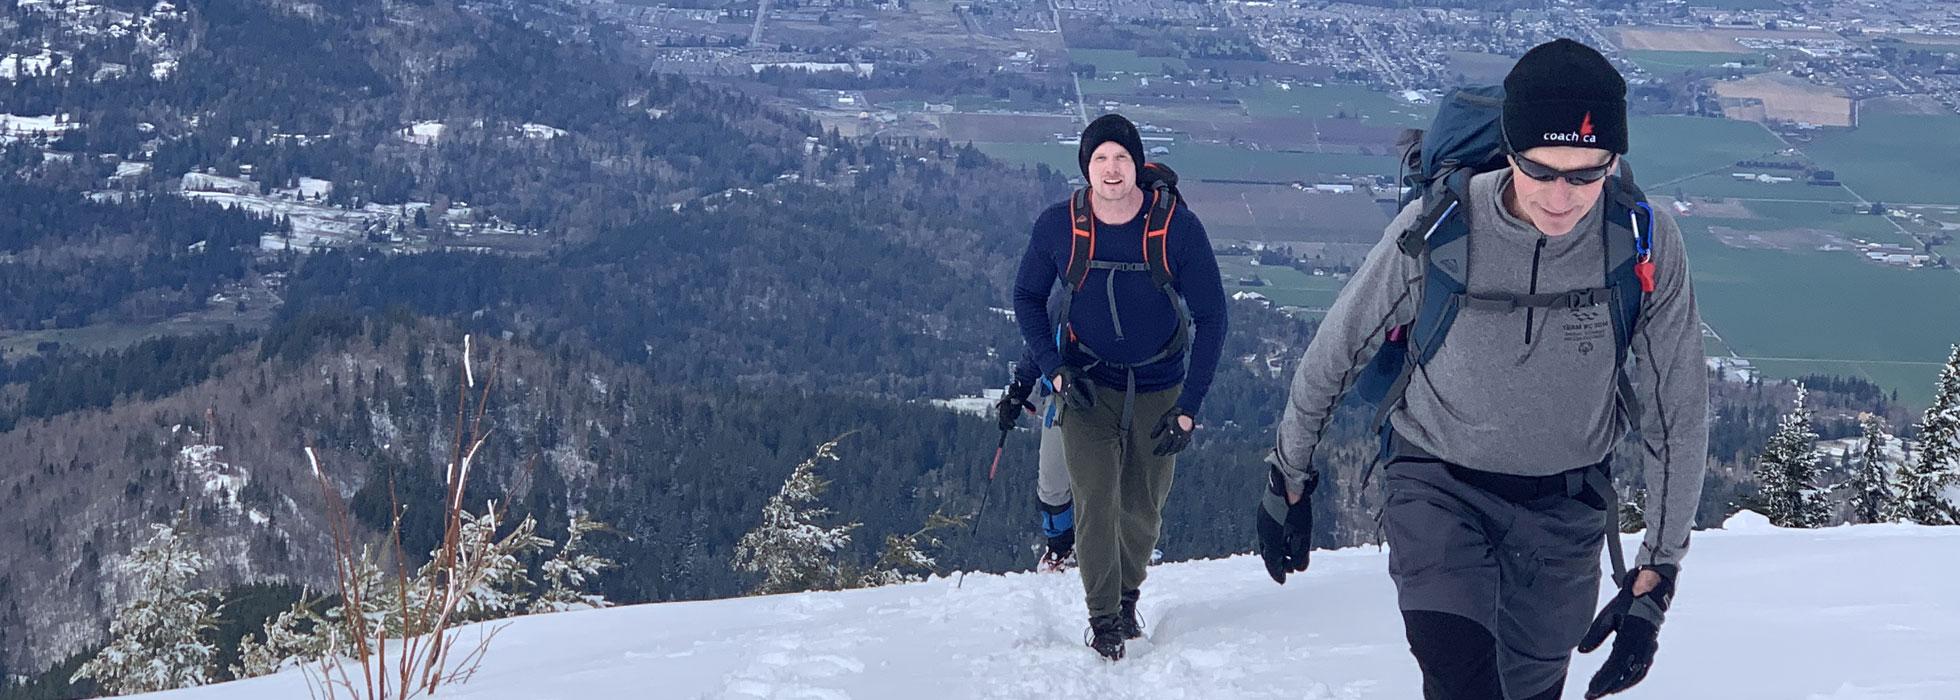 Get In Shape in Chilliwack, BC Canada close to Sardis, Vedder, Vedder Crossing, Garrison, and Garrison Crossing